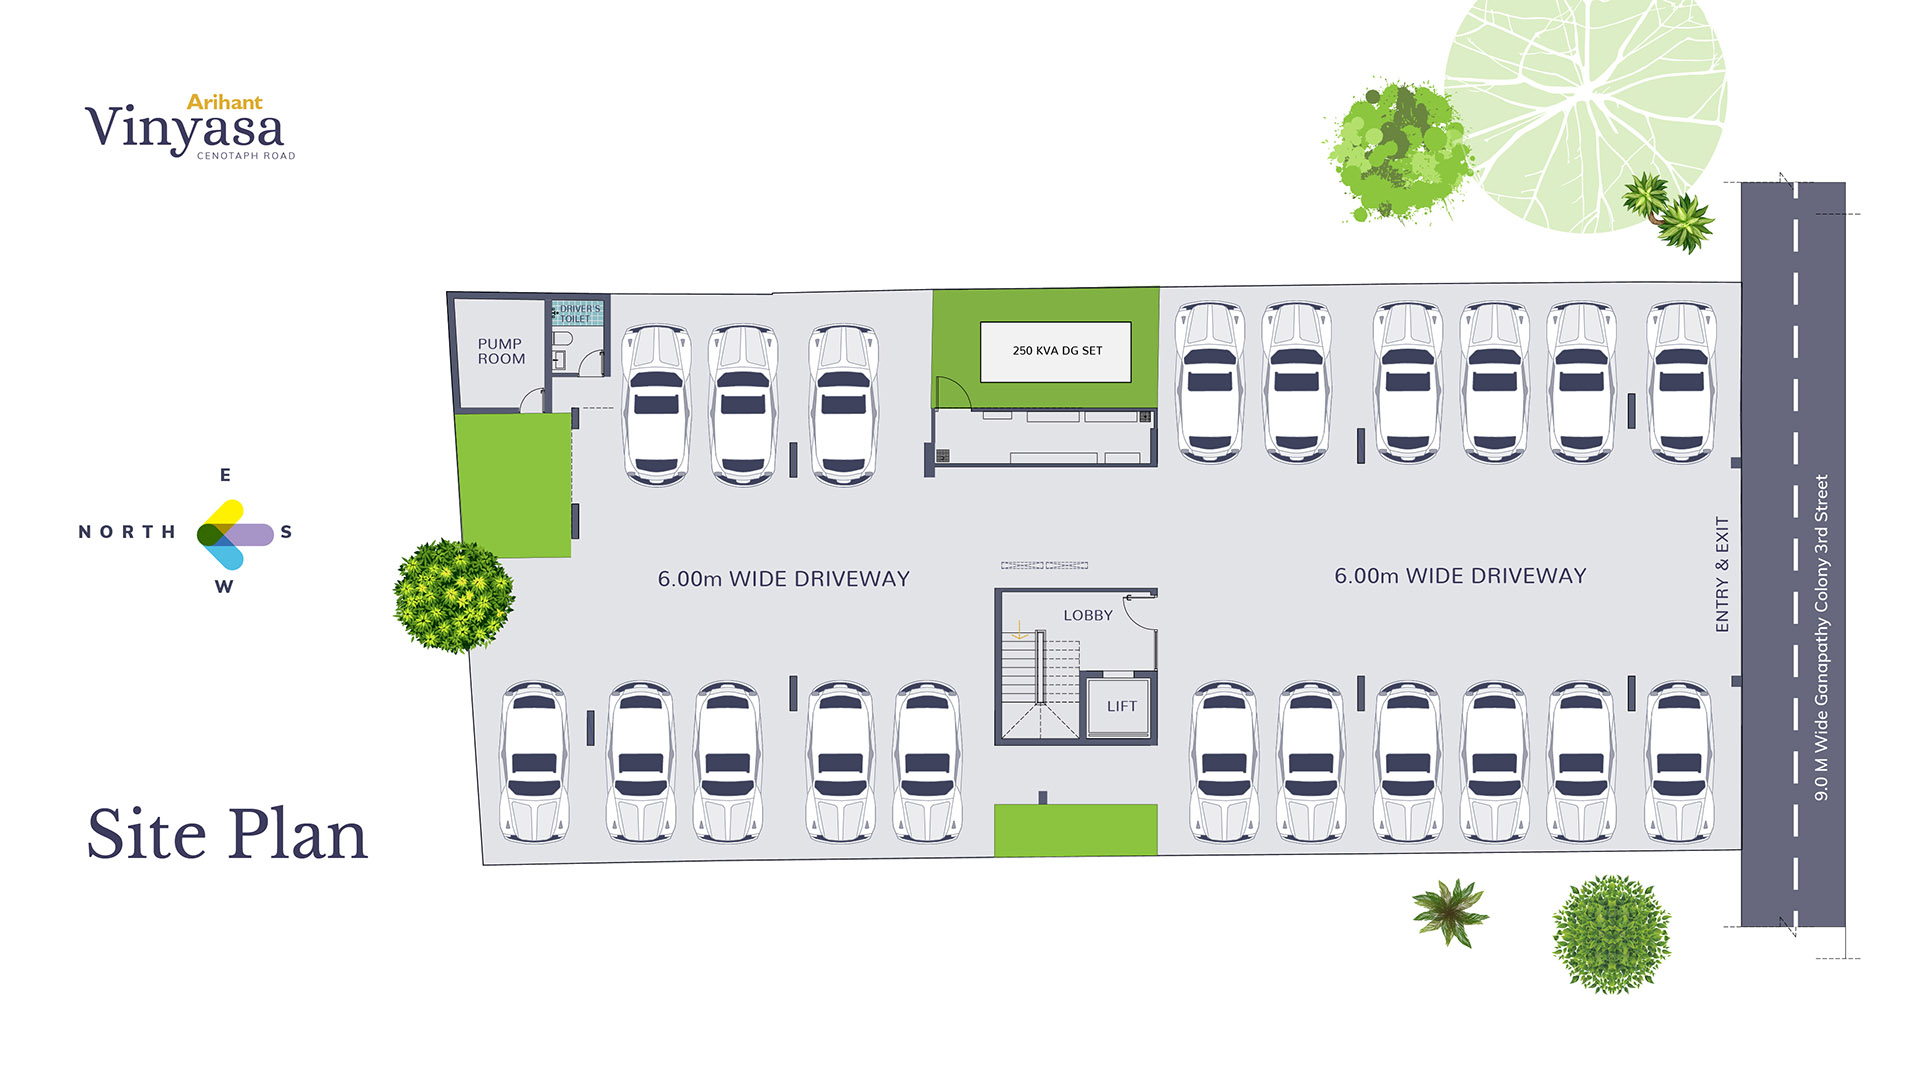 Vinyasa Site Plan